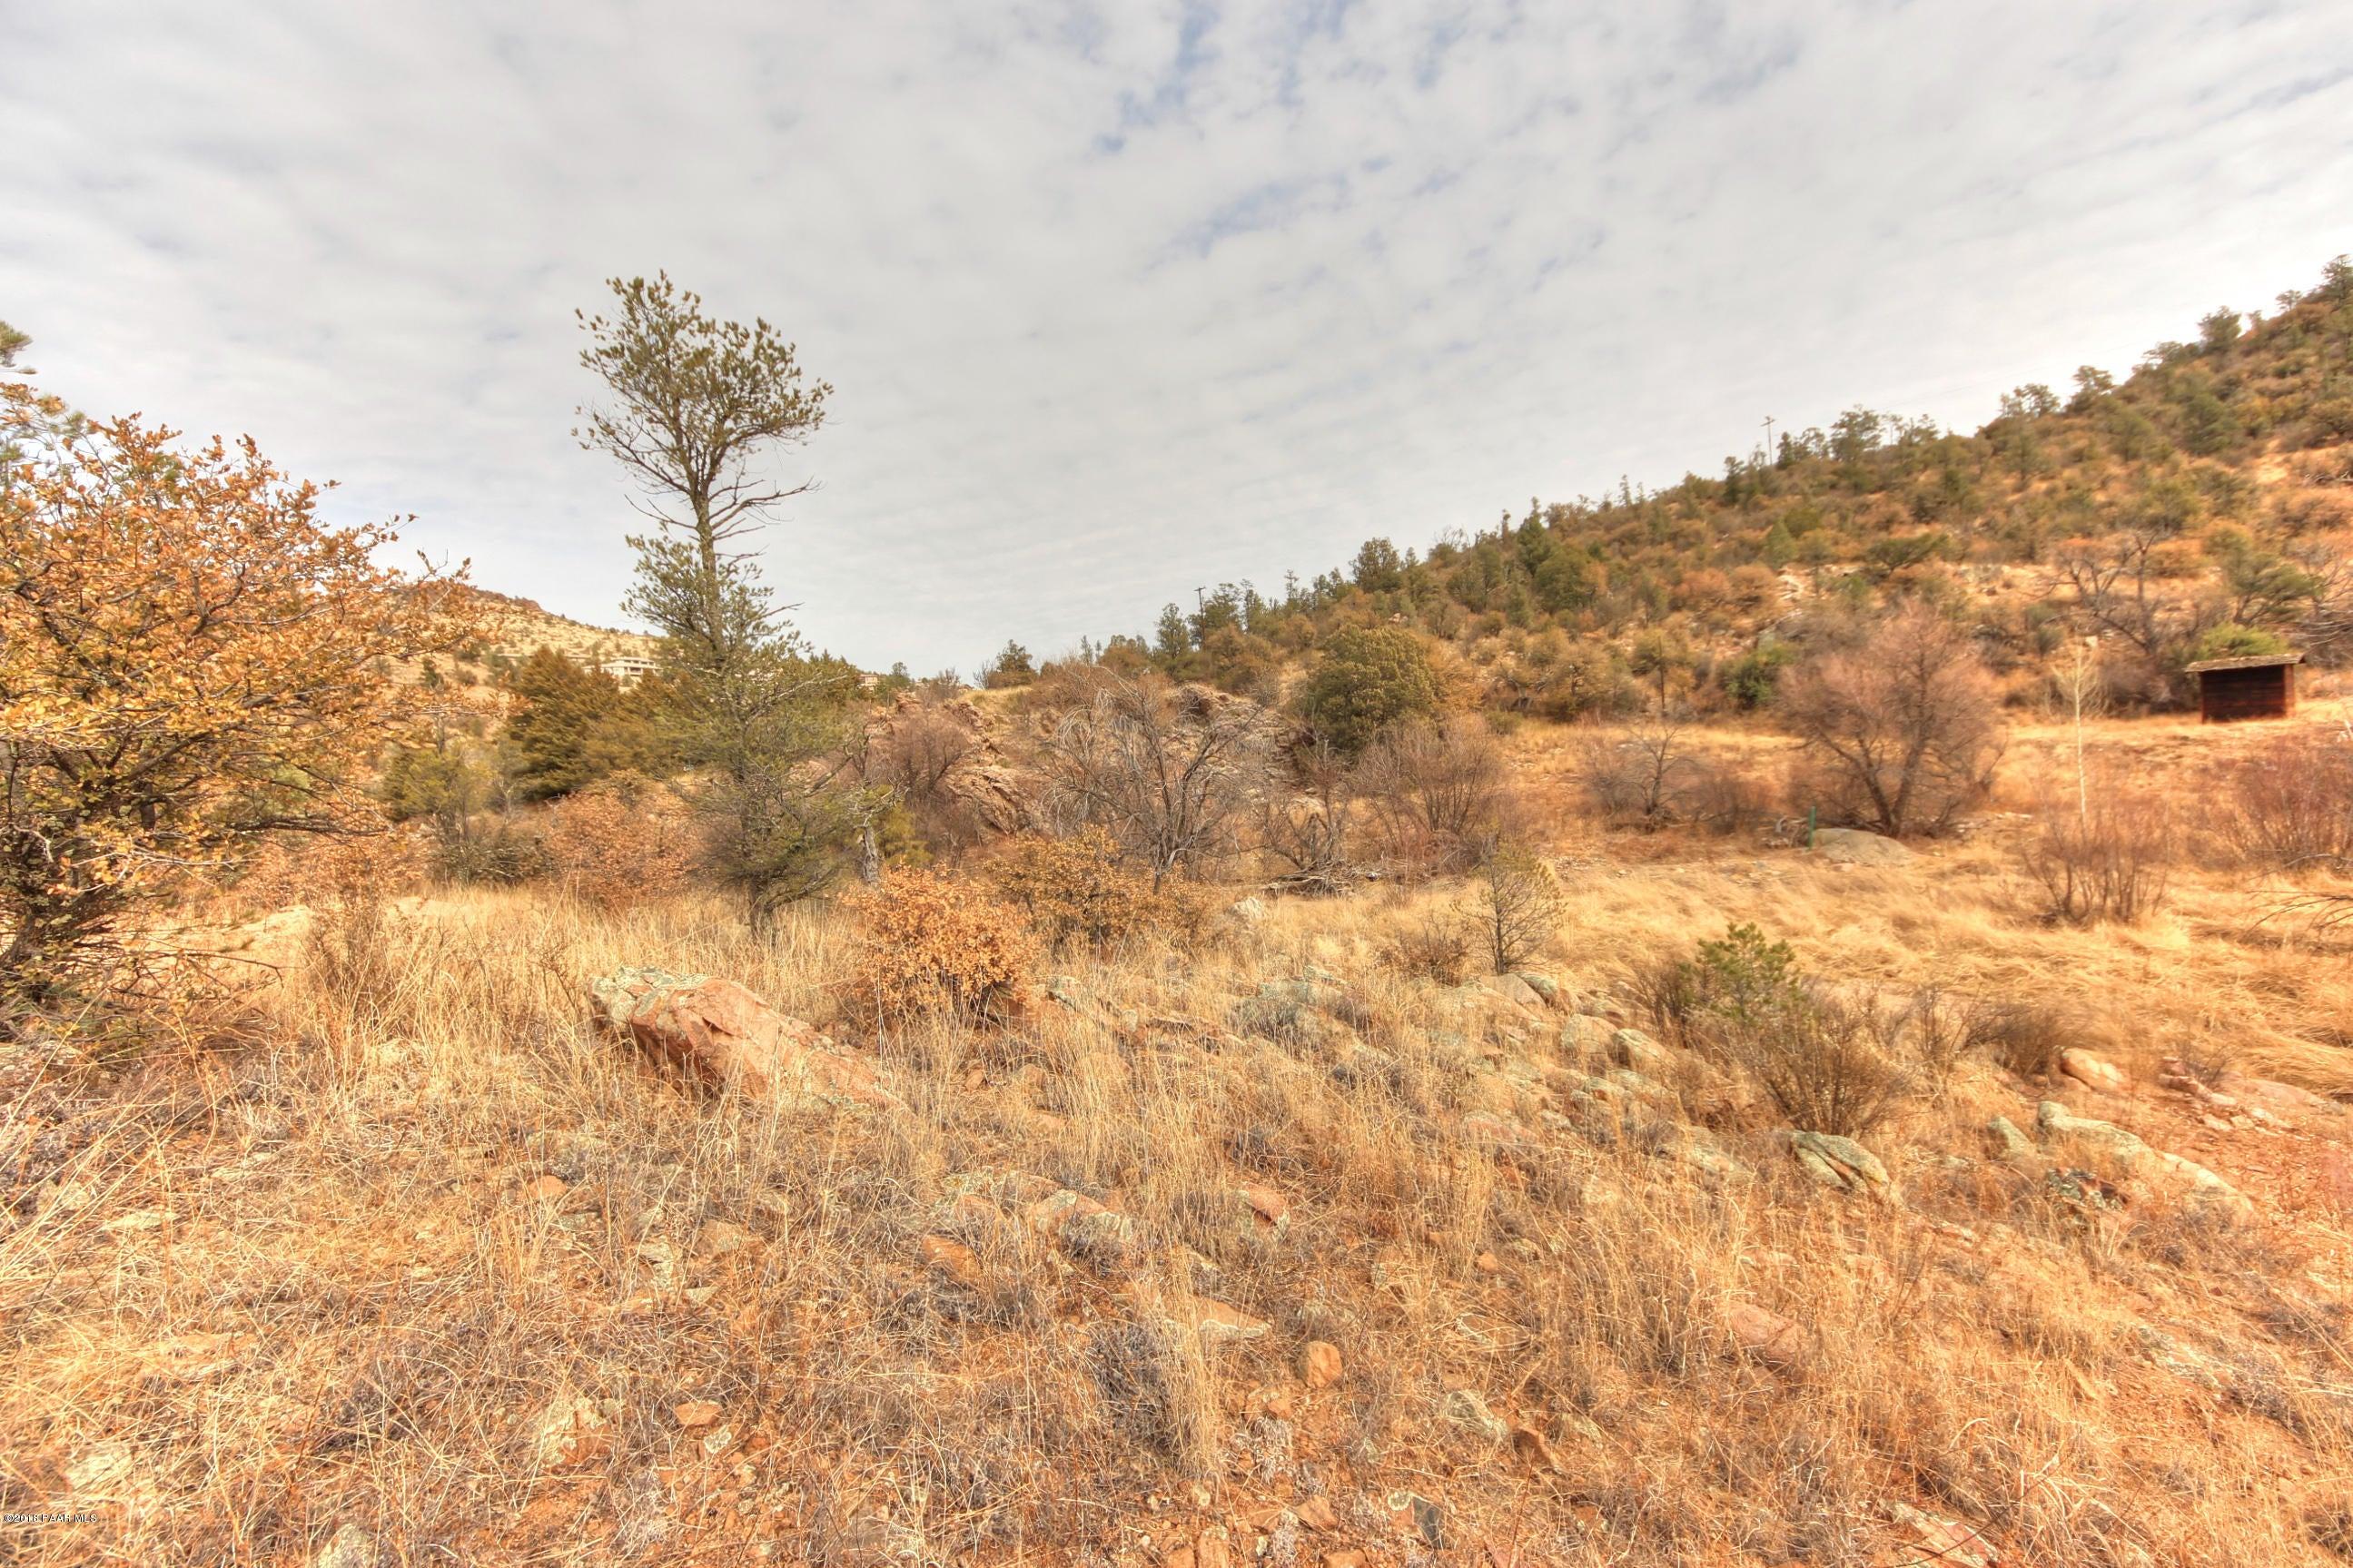 1612 Catim Way Prescott, AZ 86305 - MLS #: 1009720